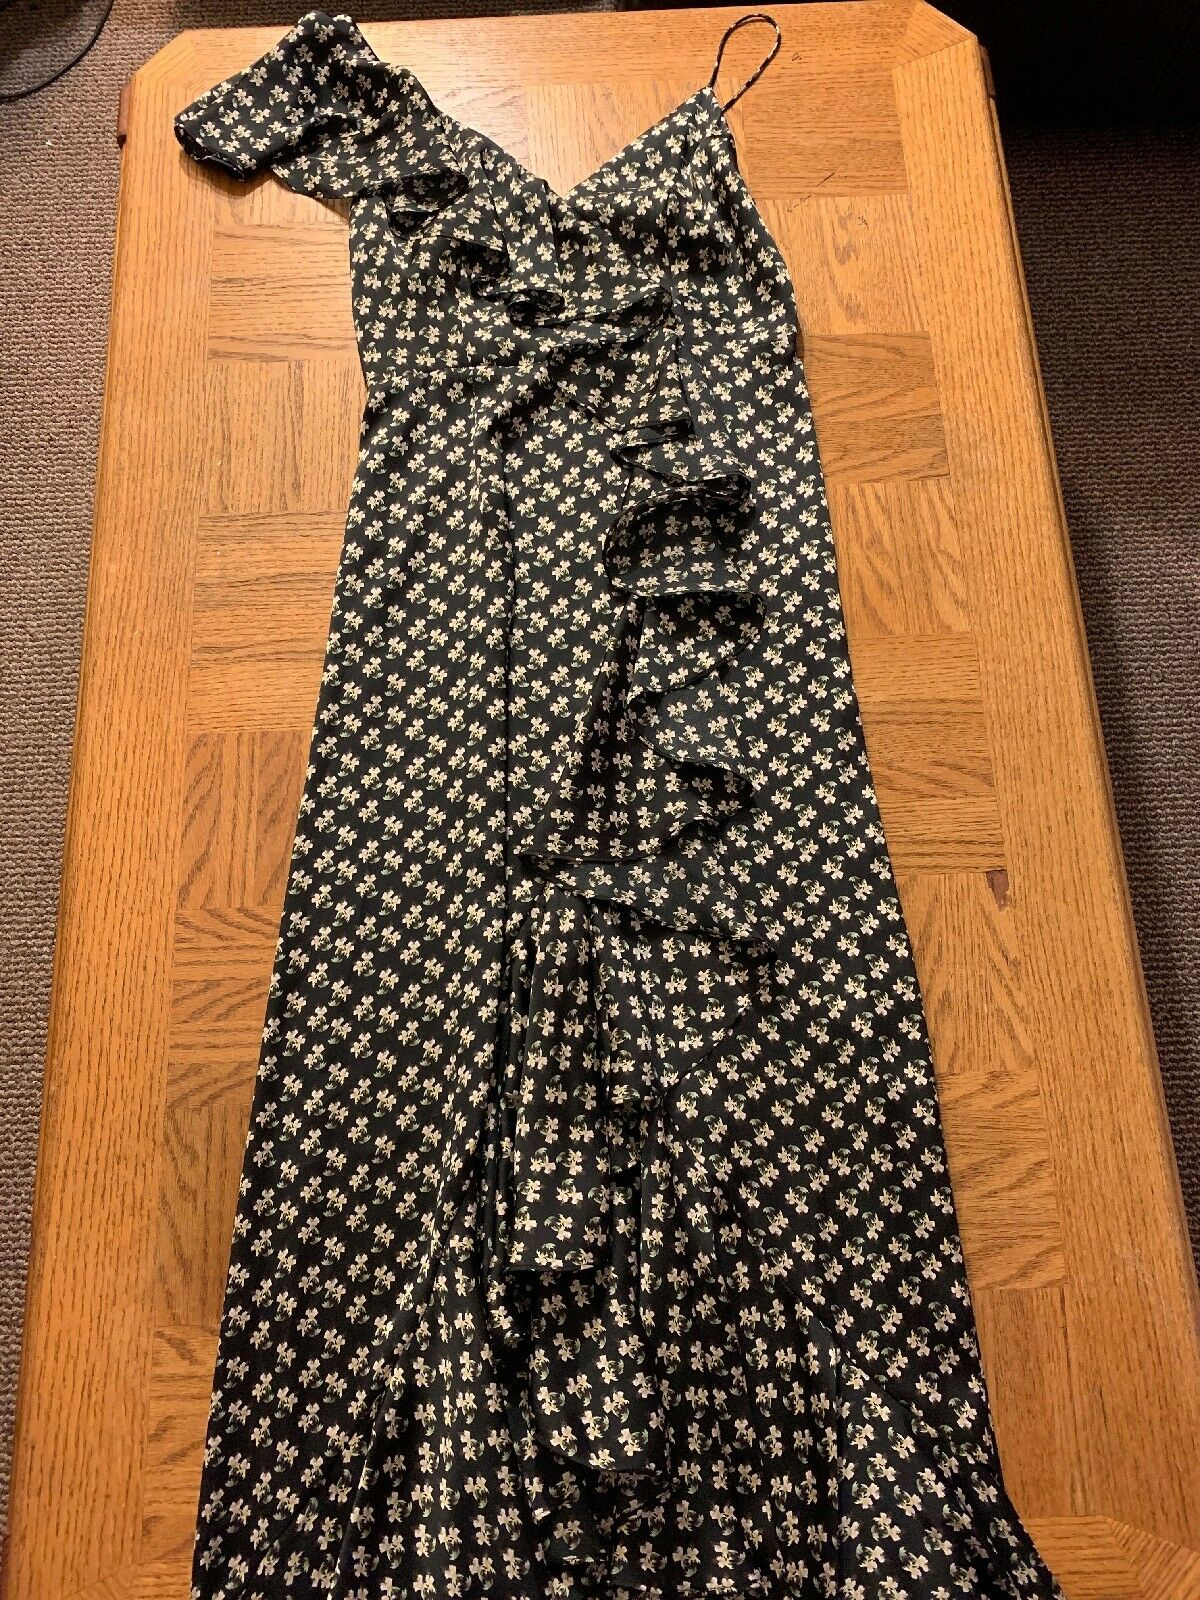 Women's Jill Stuart Dress Size 0 0115